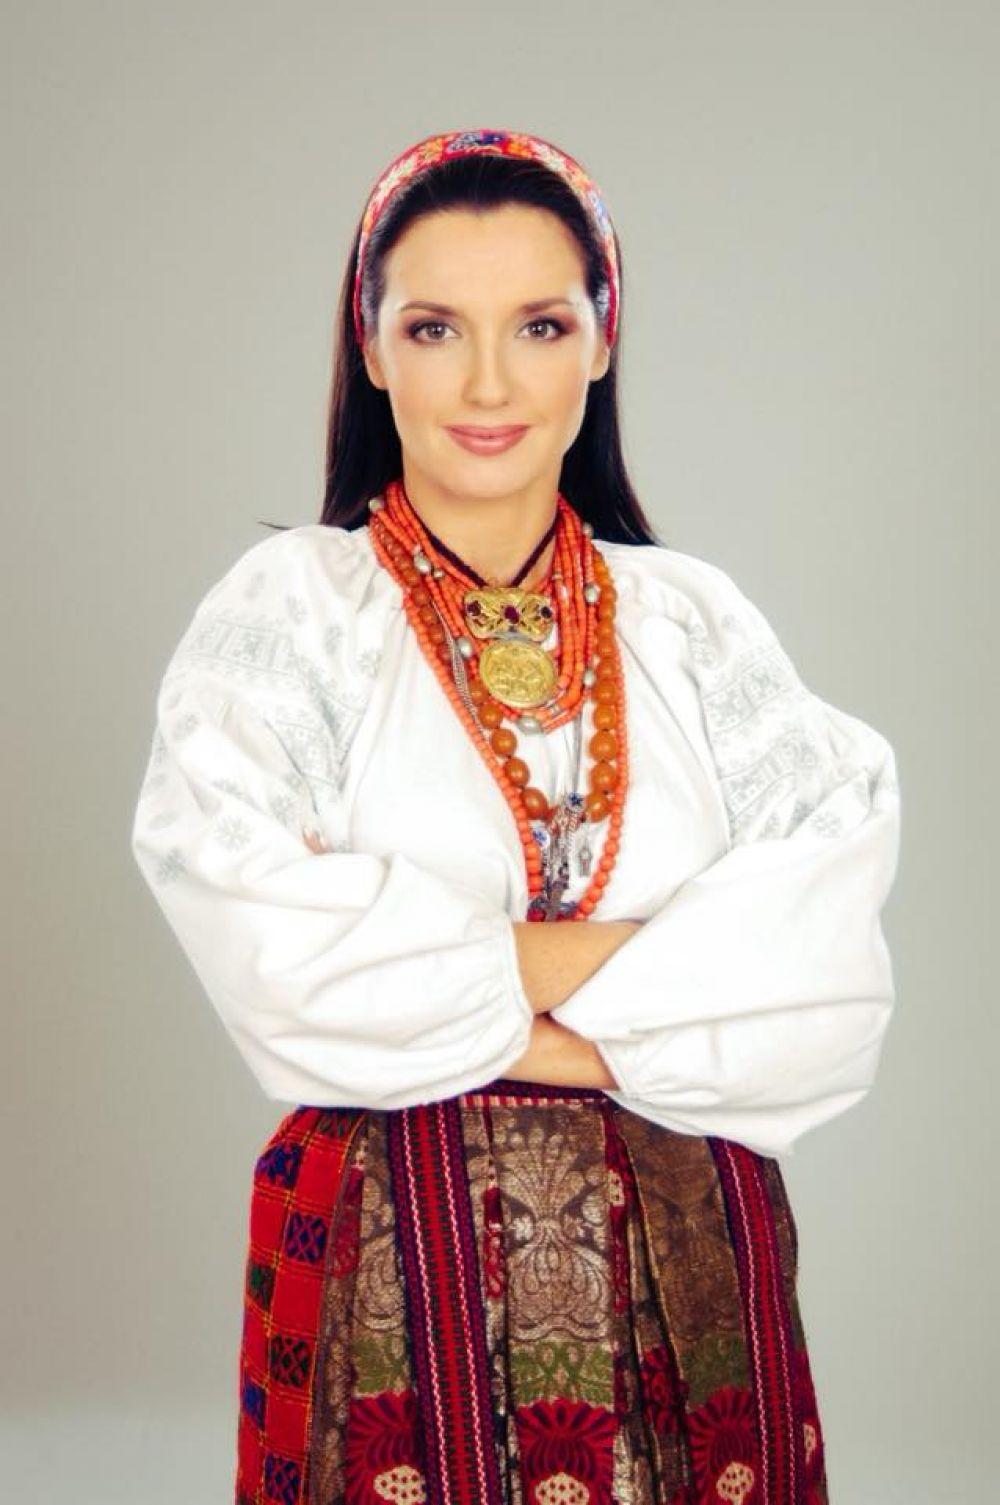 Телеведущая Оксана Марченко в красивом традиционном наряде поздравила всех с особенным праздником «символу духу, енергії, духовного багатства, мудрості українців».